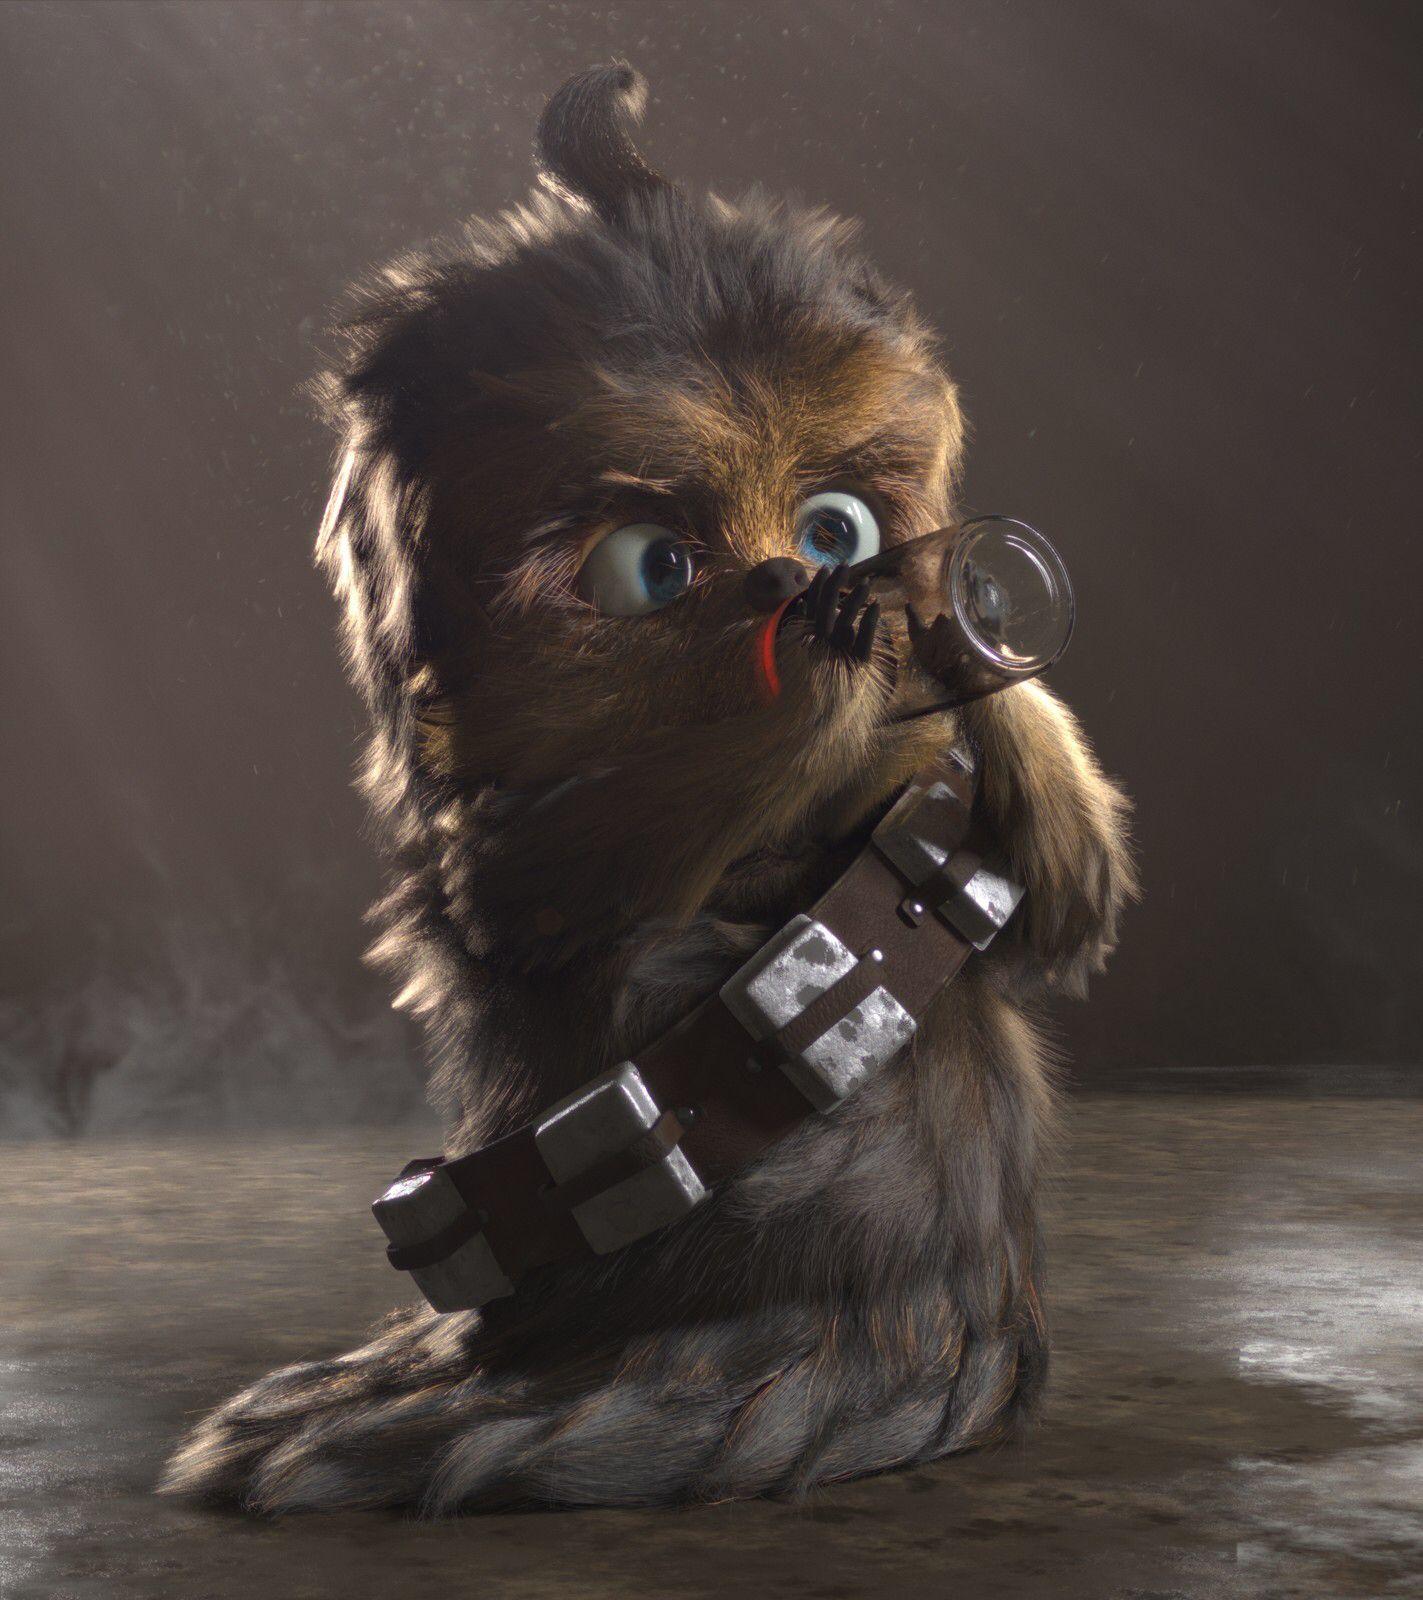 Baby Chewbacca | Star Wars | #starwars #starwarsart #starwarsfanart #chewbacca #wookie | Star ...